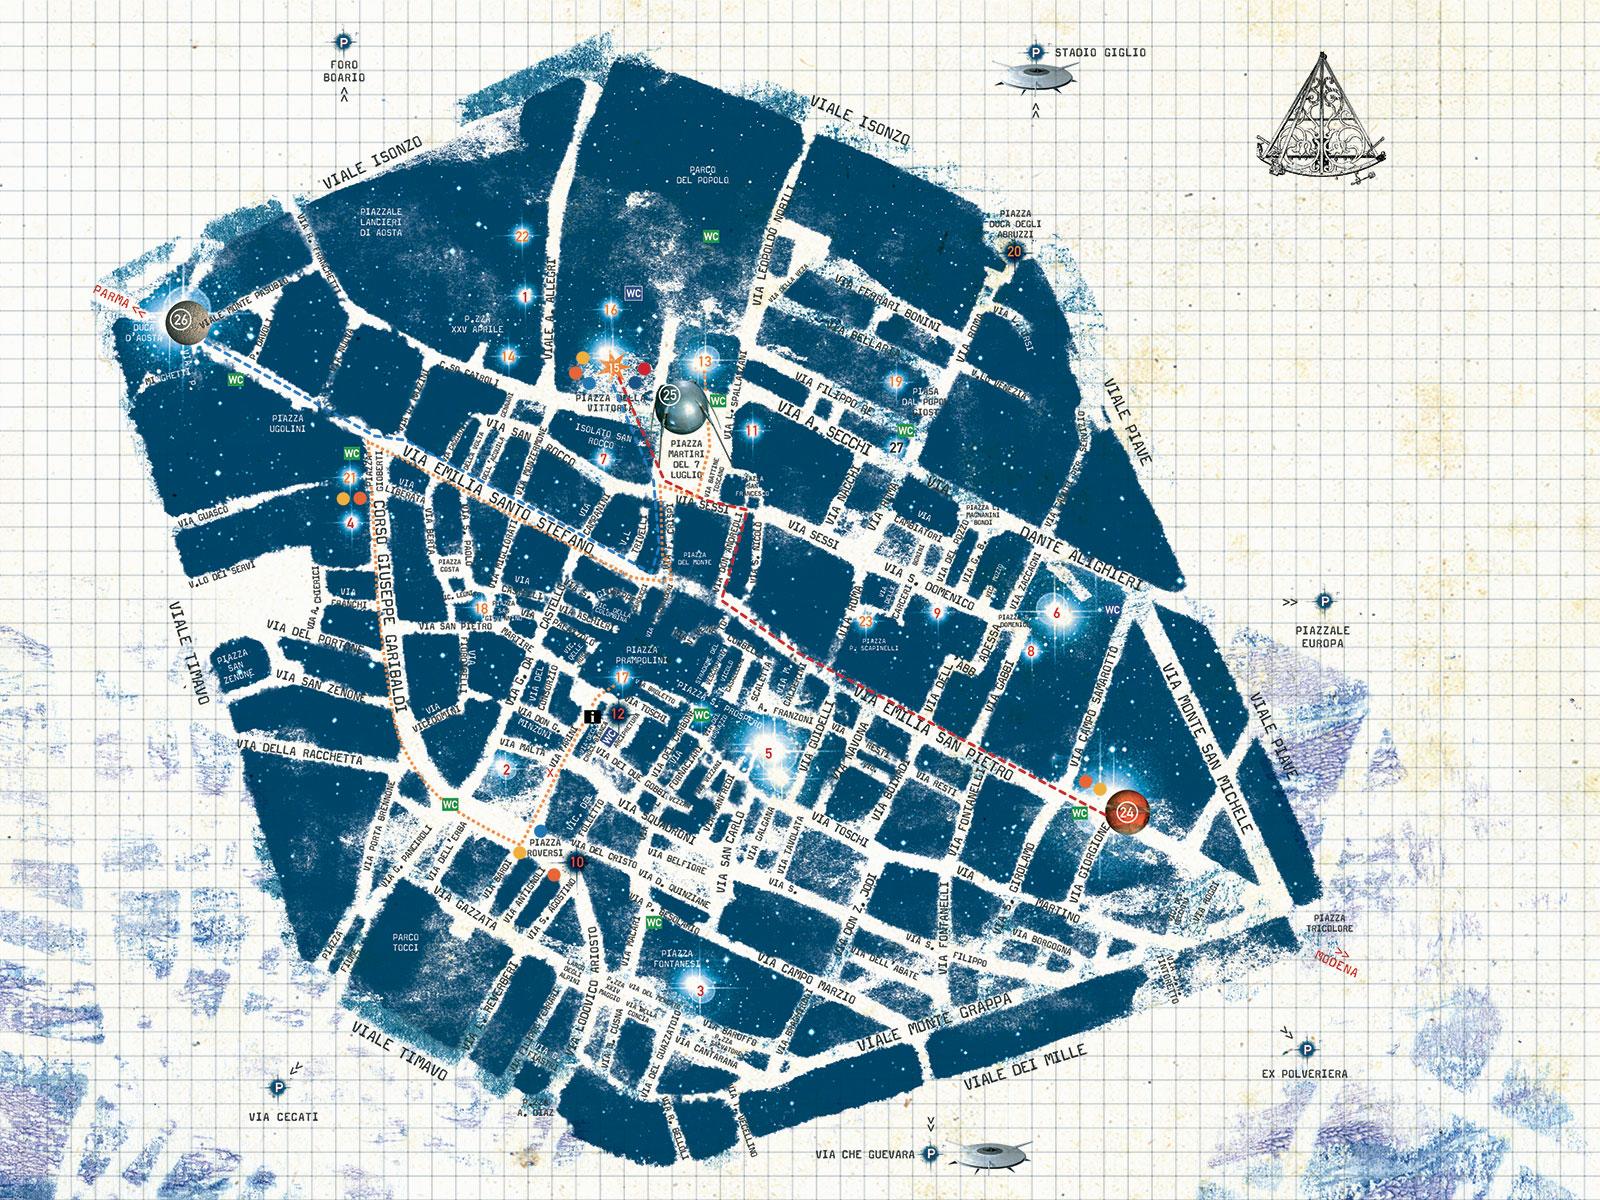 NOTTE-BIANCA-mappa